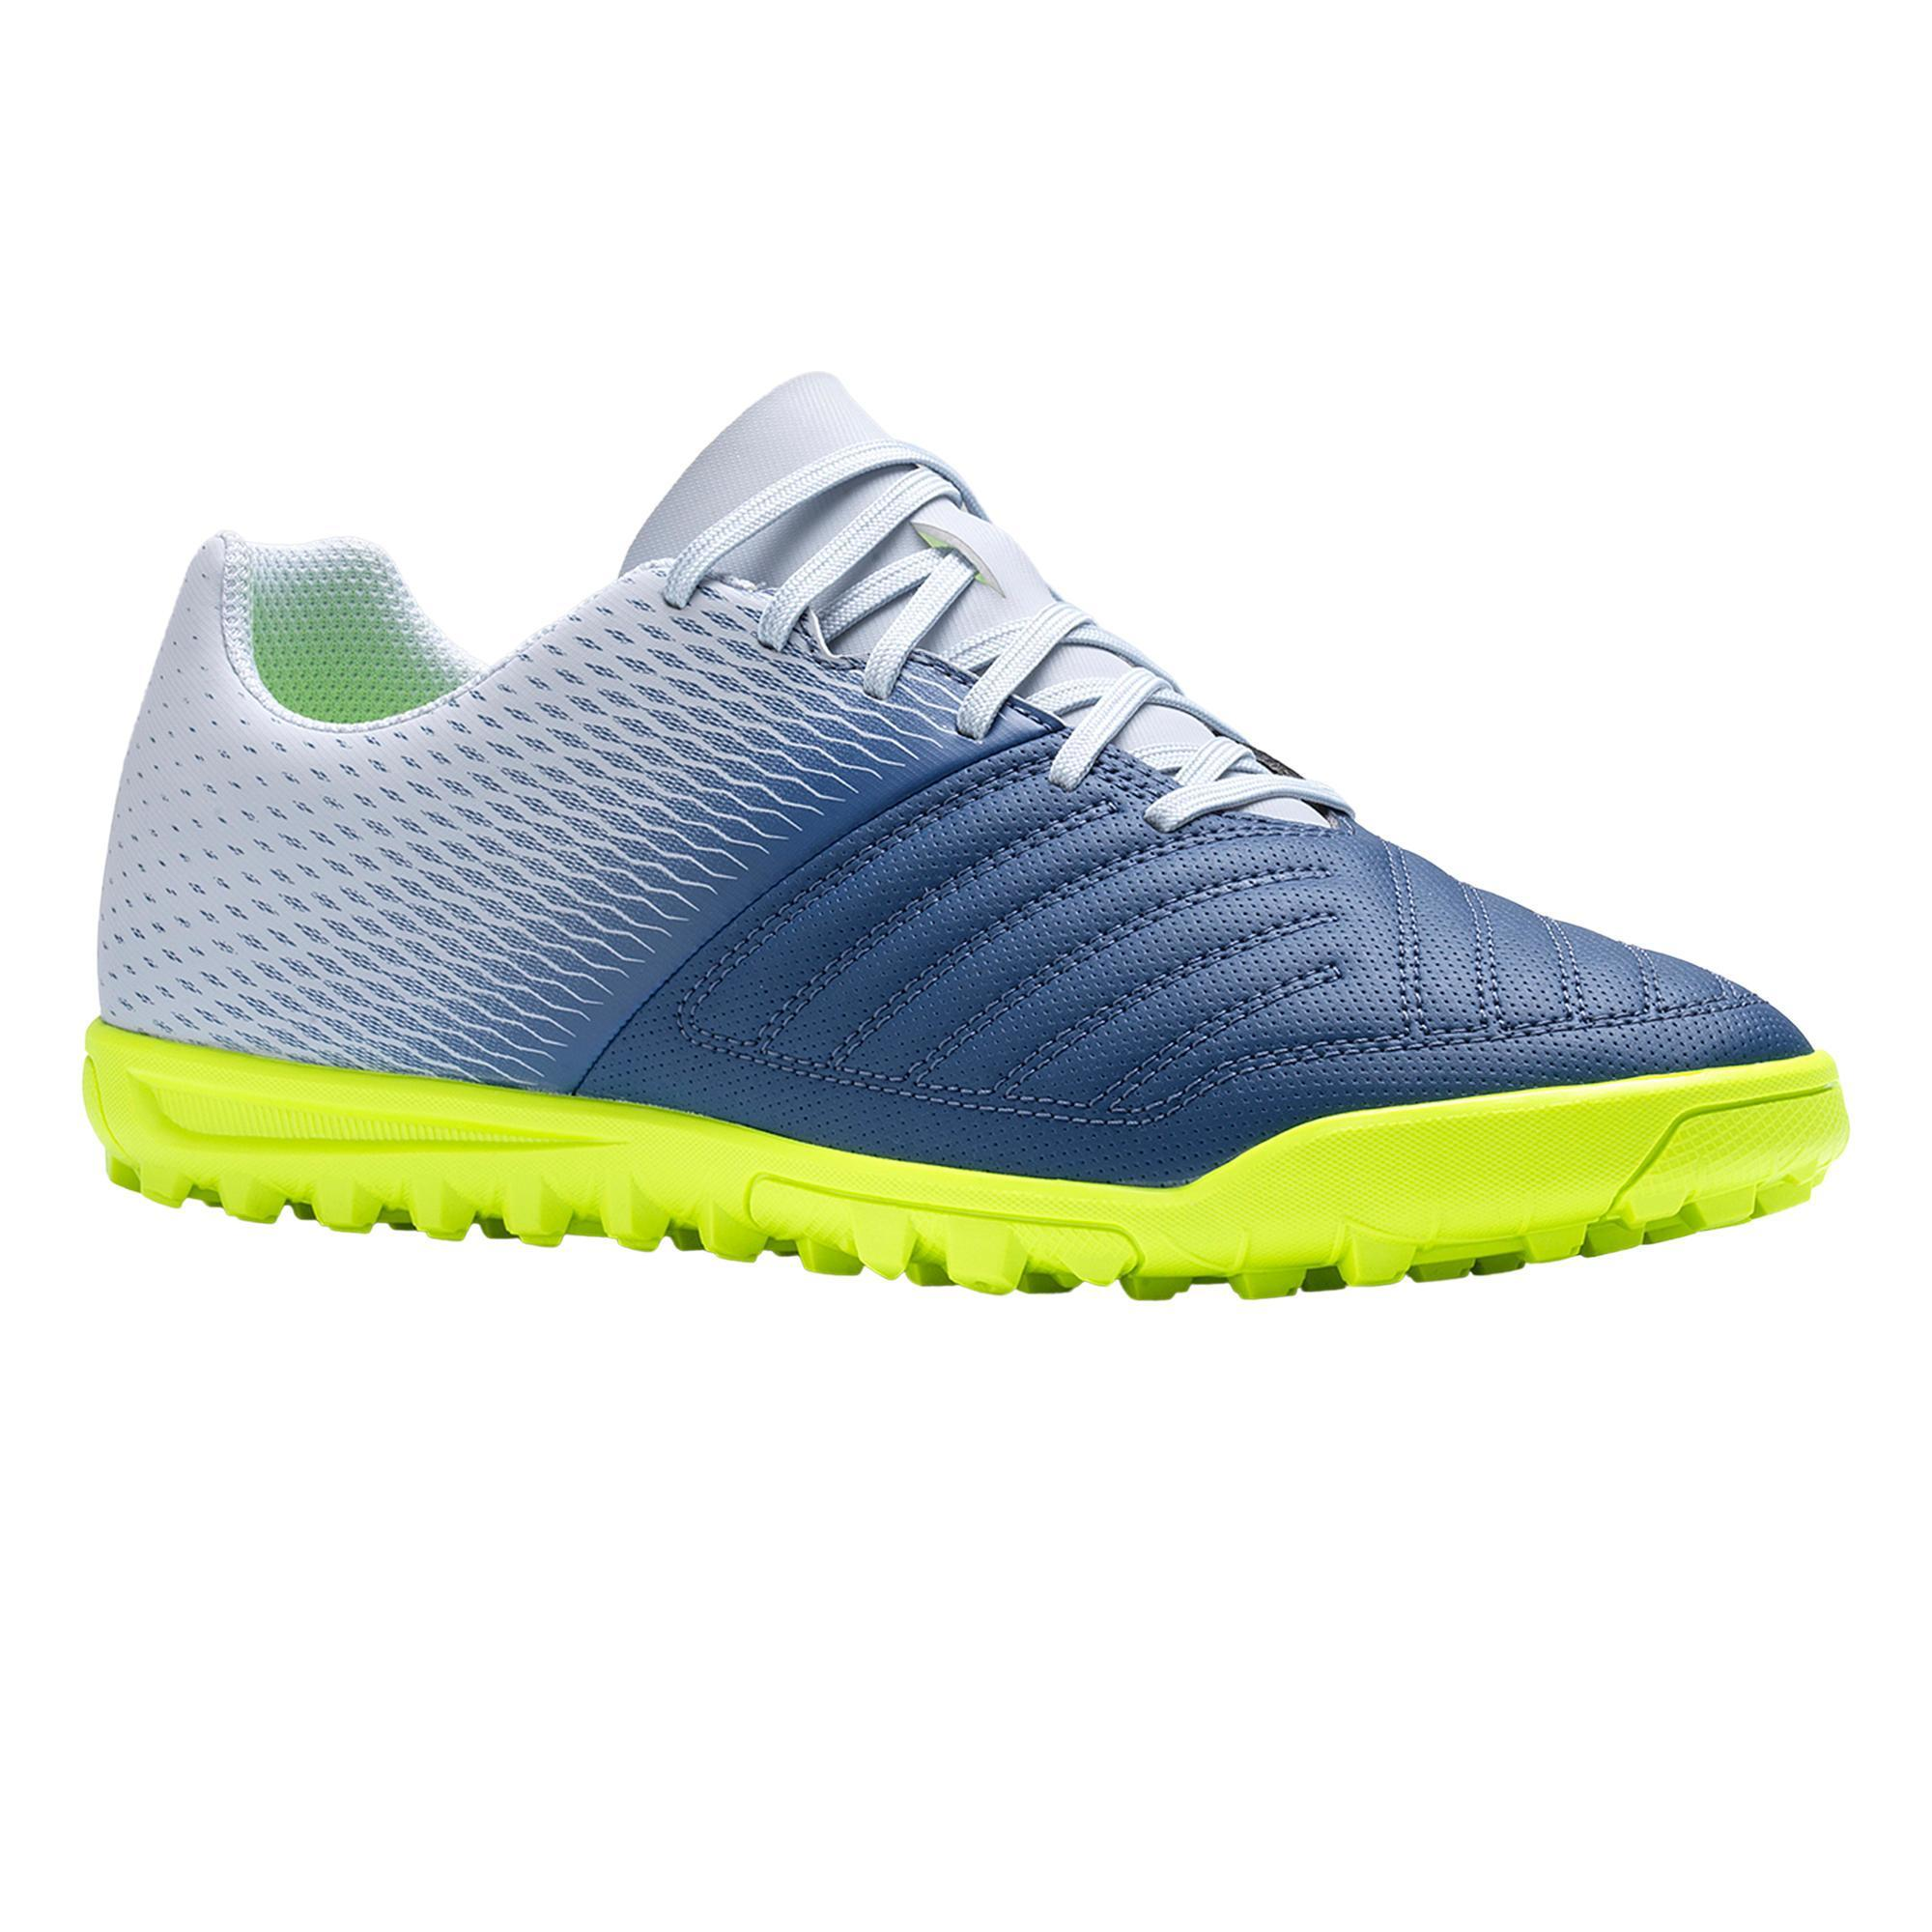 good service new product reputable site Chaussures de Football pas cher: Kipsta, Nike, Adidas, Puma ...